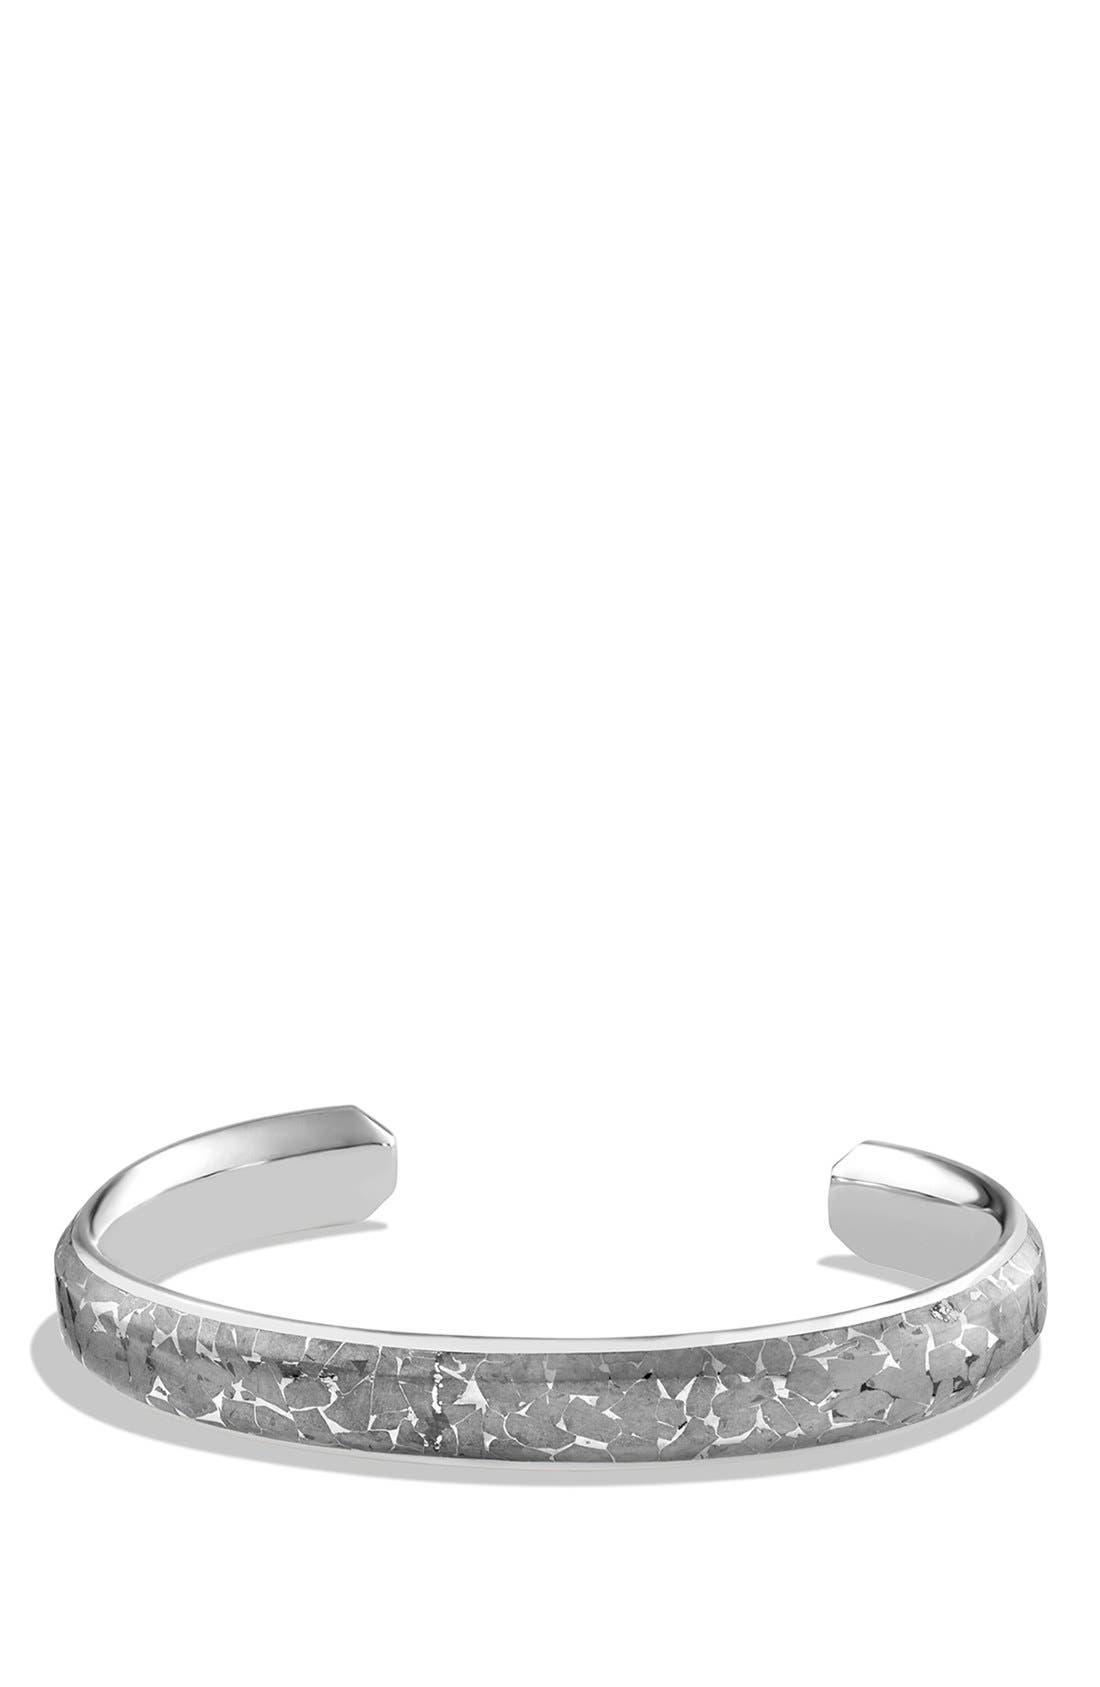 'Meteorite' Fused Cuff Bracelet,                             Main thumbnail 1, color,                             020